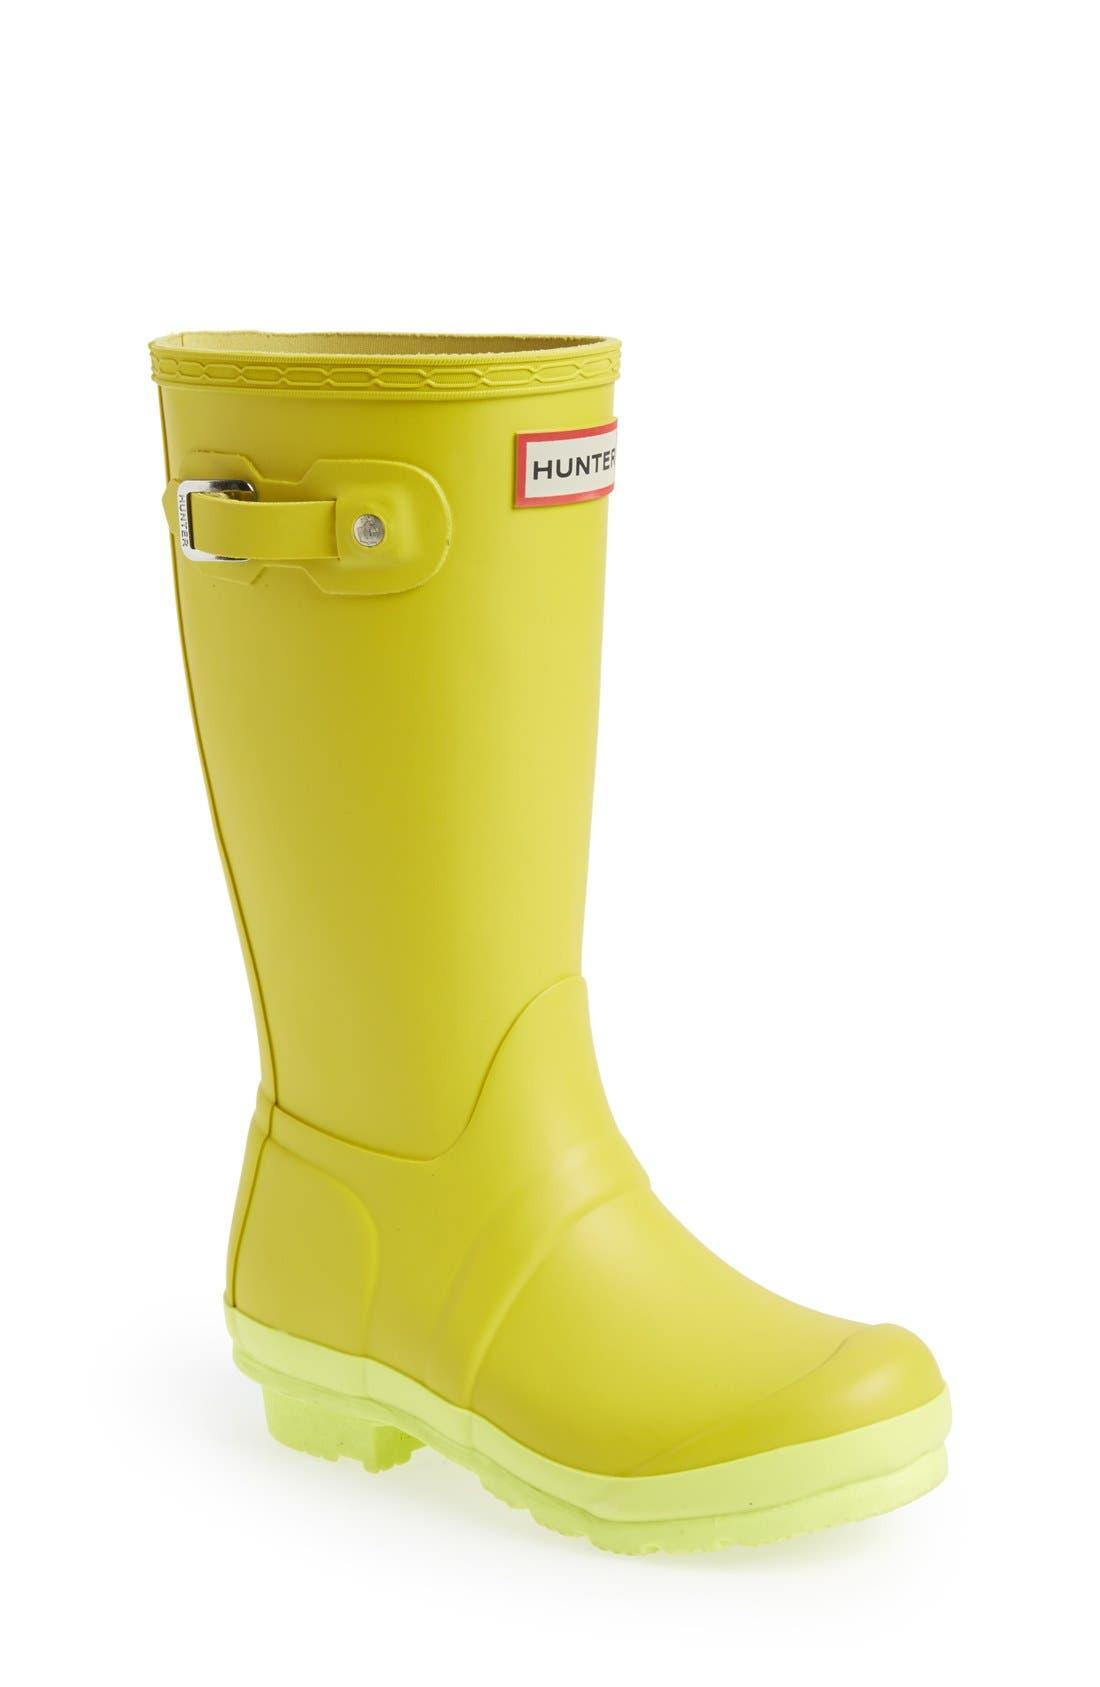 Alternate Image 1 Selected - Hunter 'Original Contrast Sole' Waterproof Rain Boot (Little Kid & Big Kid)